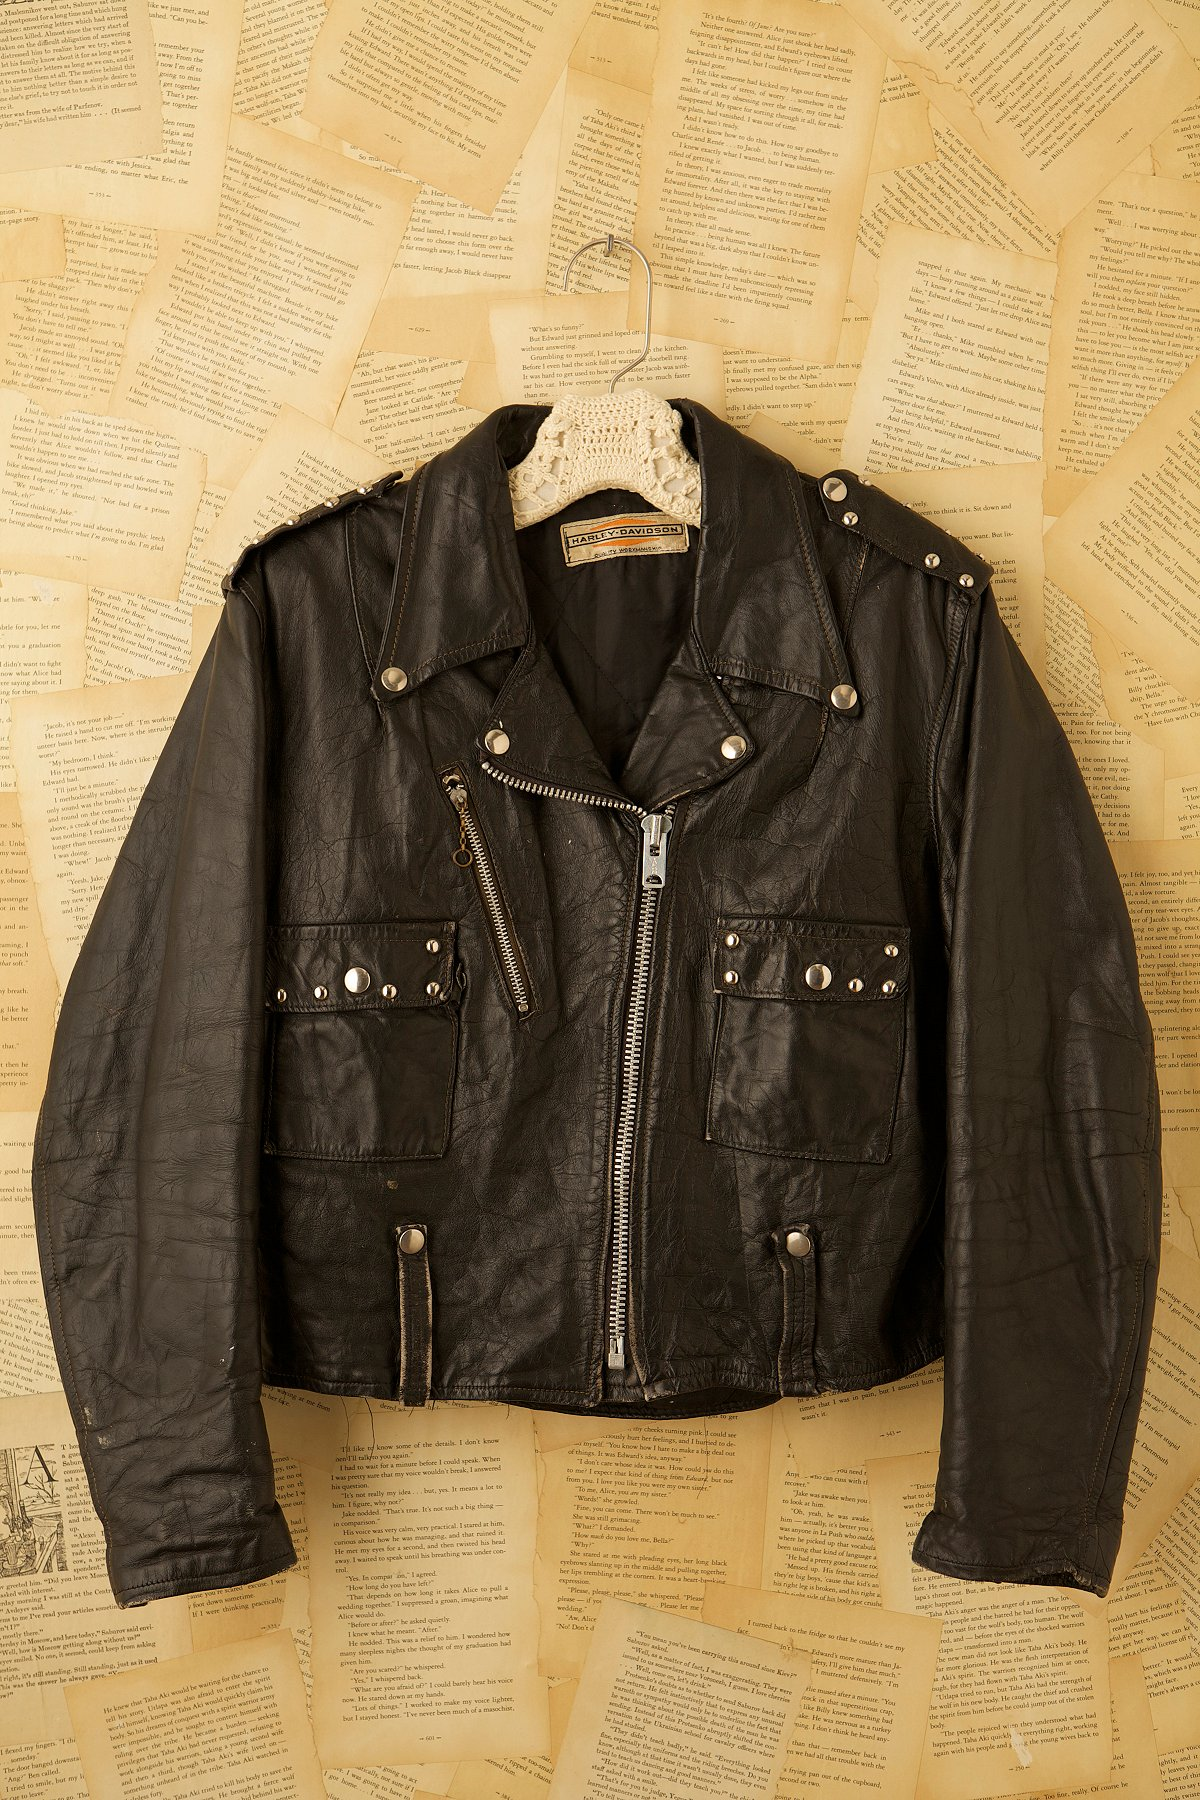 Vintage 1970s Black Leather Jacket